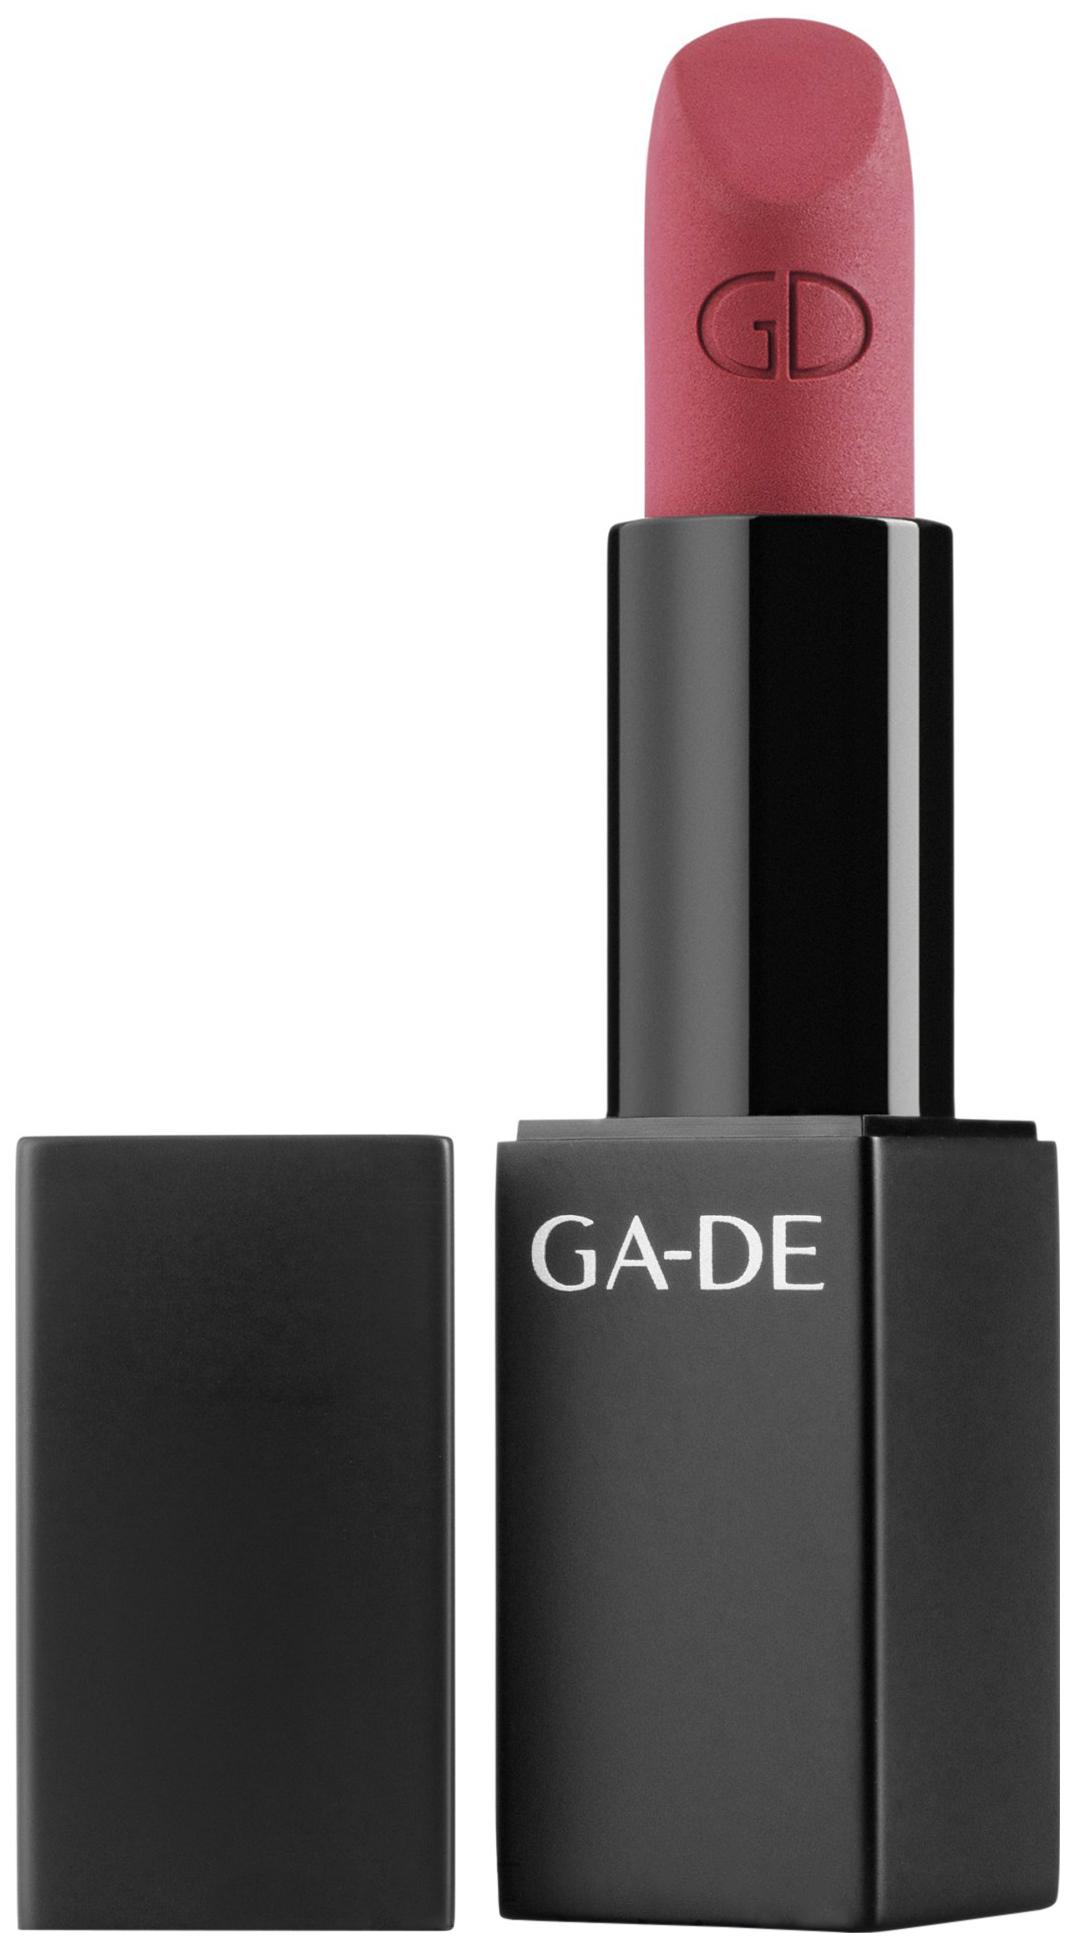 Помада Ga-De Velveteen Pure Matte Lipstick 757 Baroque Rose 4 г